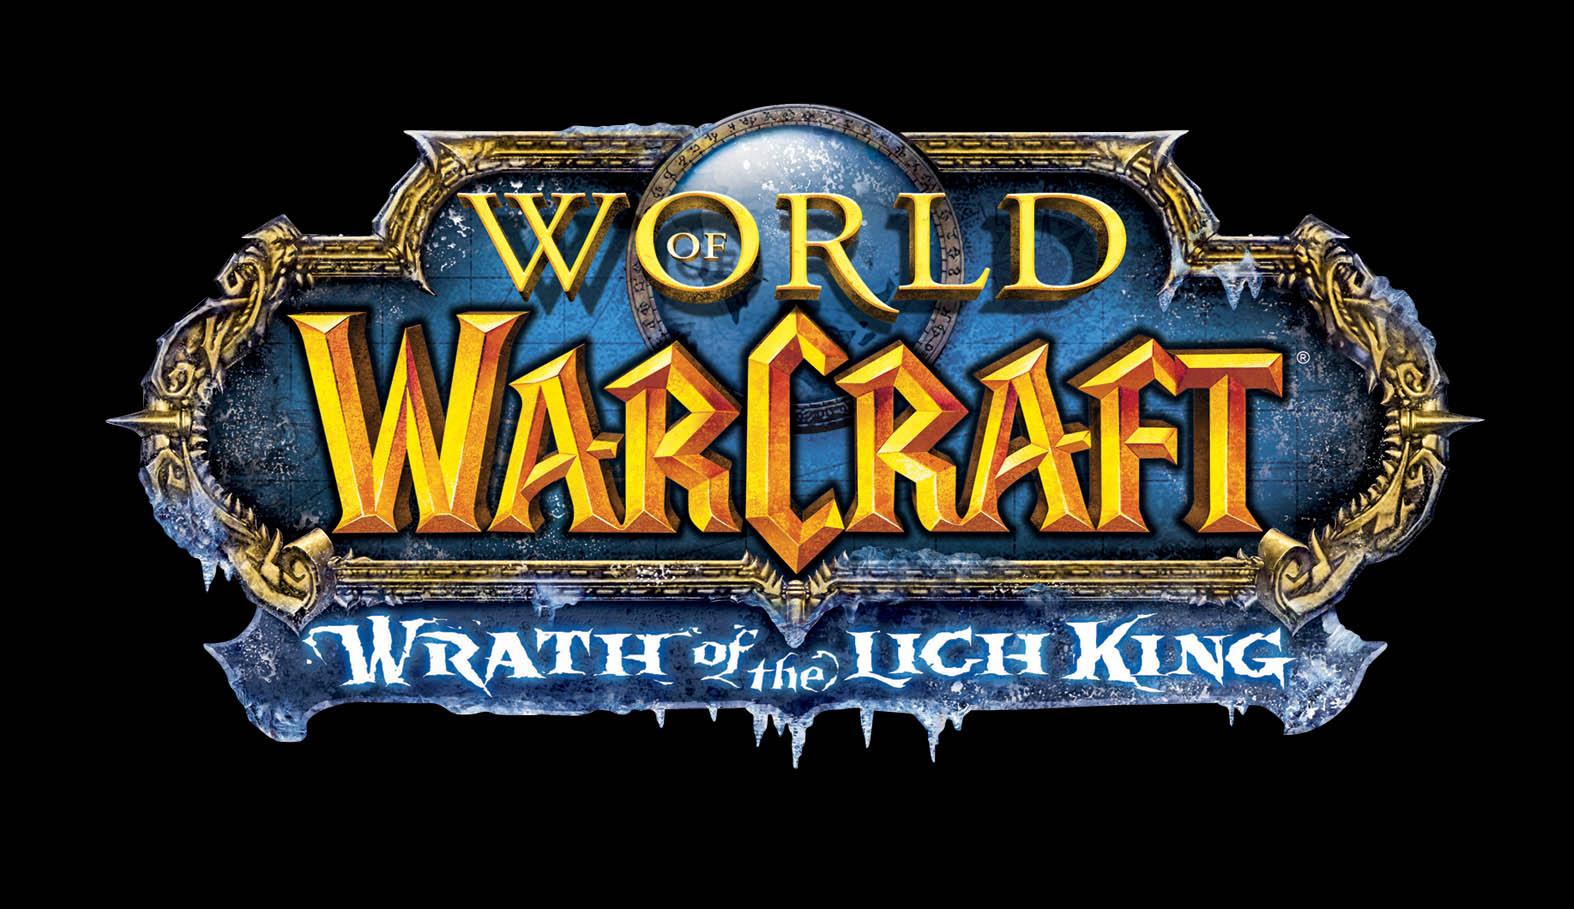 http://1.bp.blogspot.com/-i6XB6hVyBt0/TeaFrIns-rI/AAAAAAAAACs/IvUoLREEfrI/s1600/wow_wrath_of_the_lich_king2.jpg